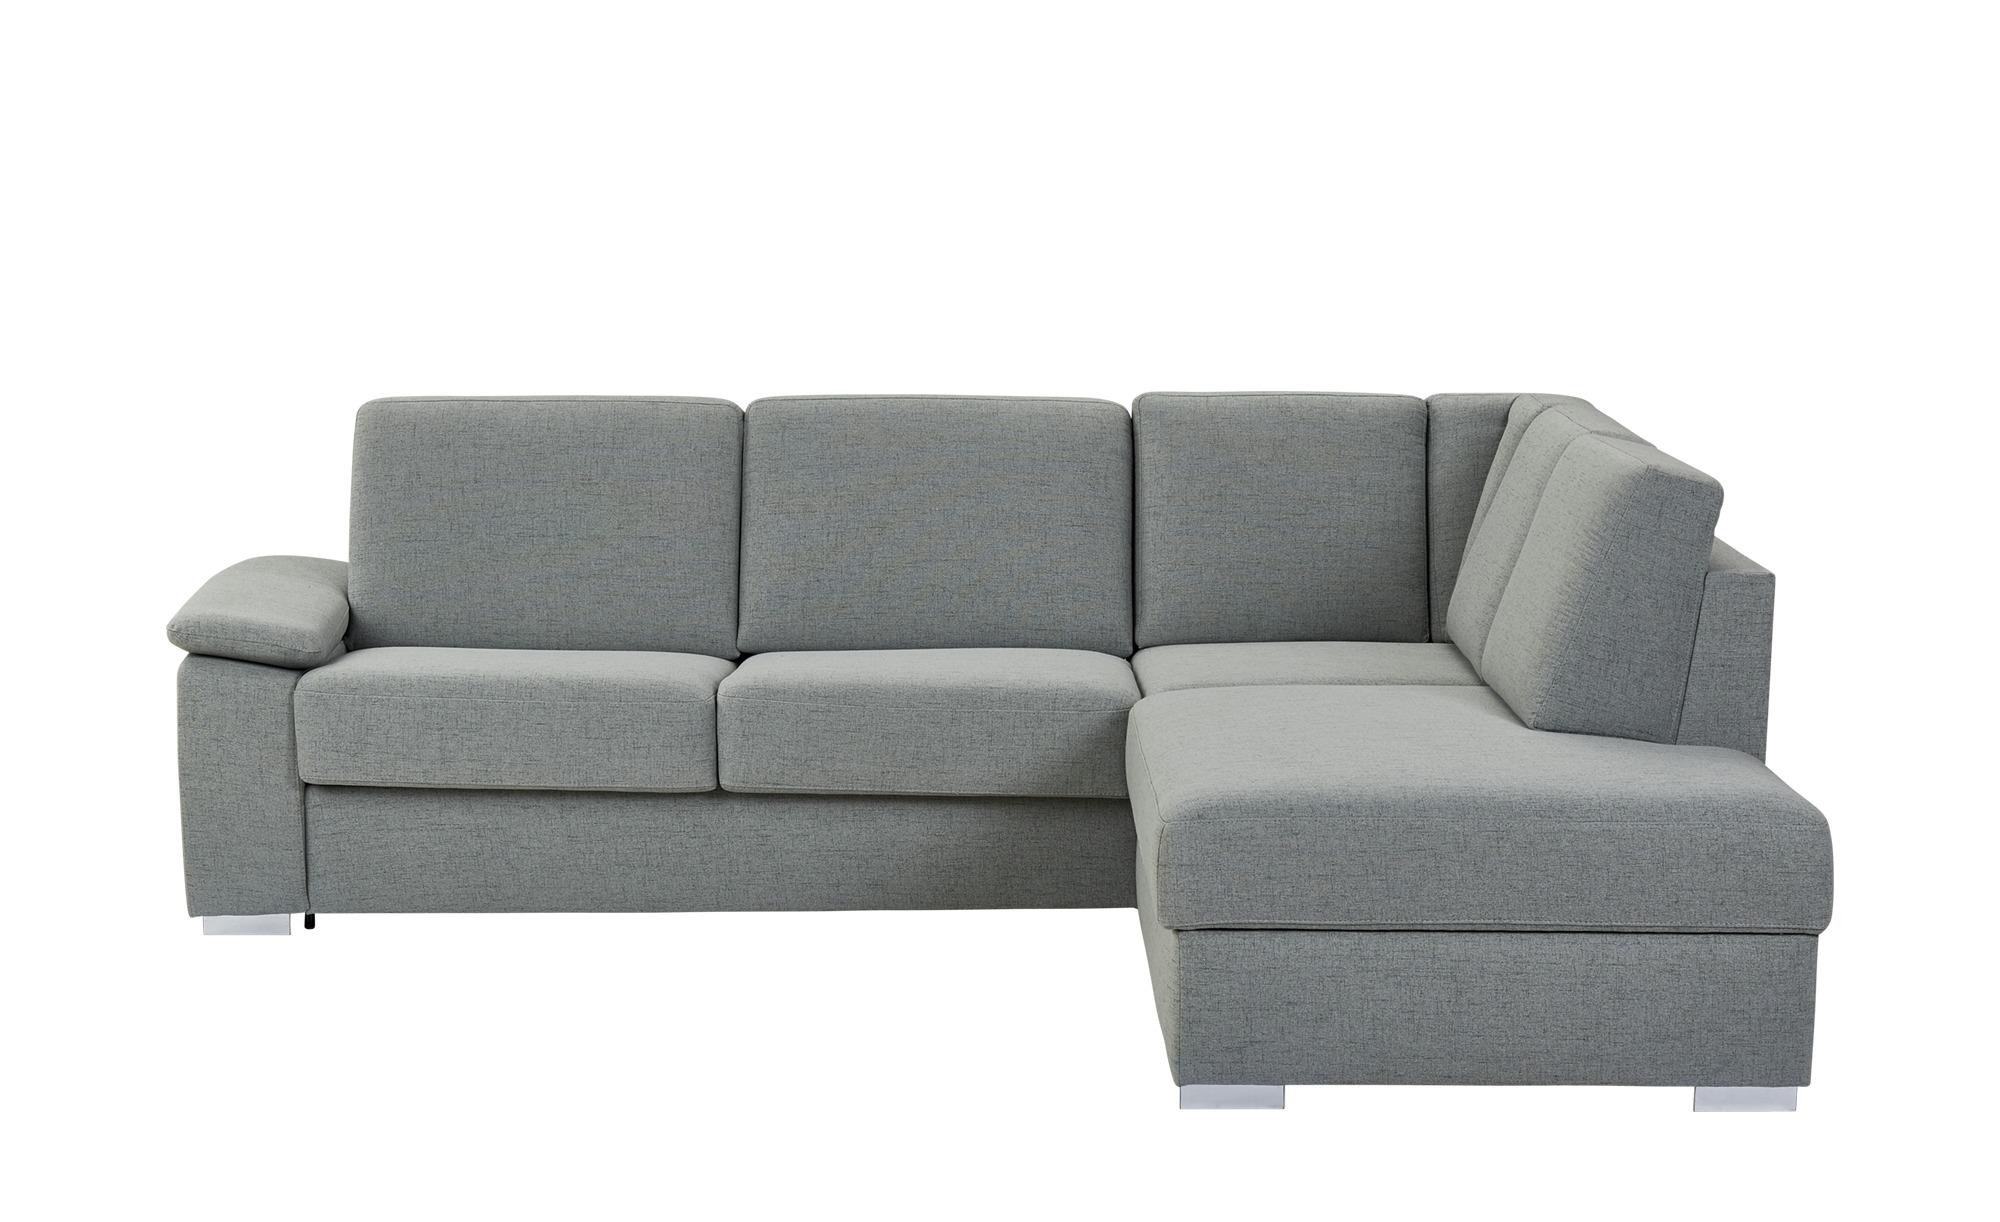 Ecksofa Ecksofa Sofa Couch